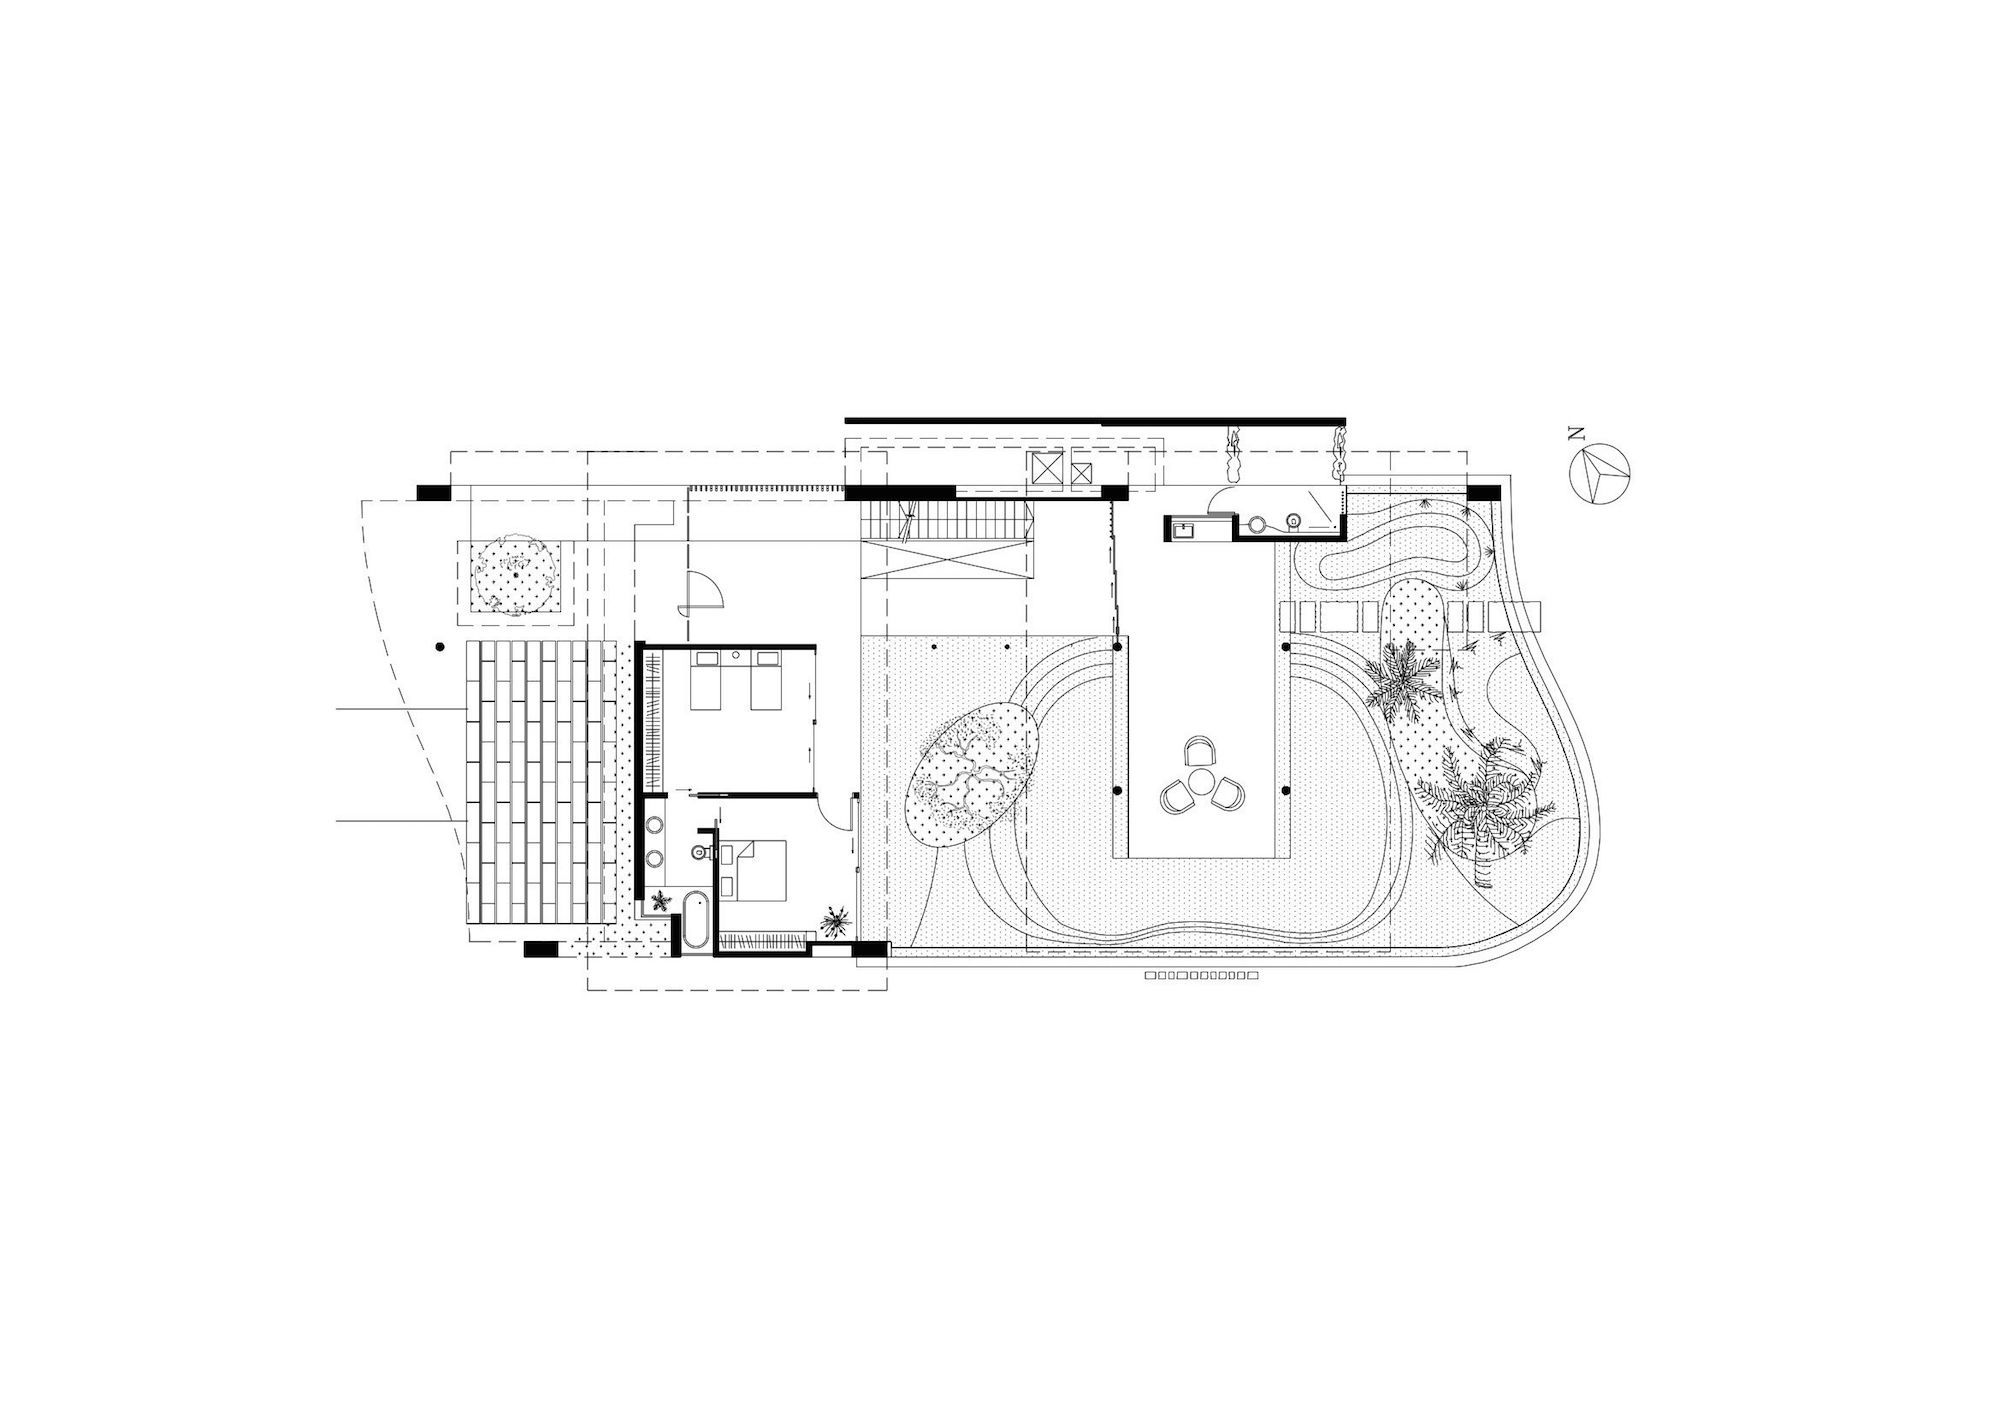 Fish house layouts